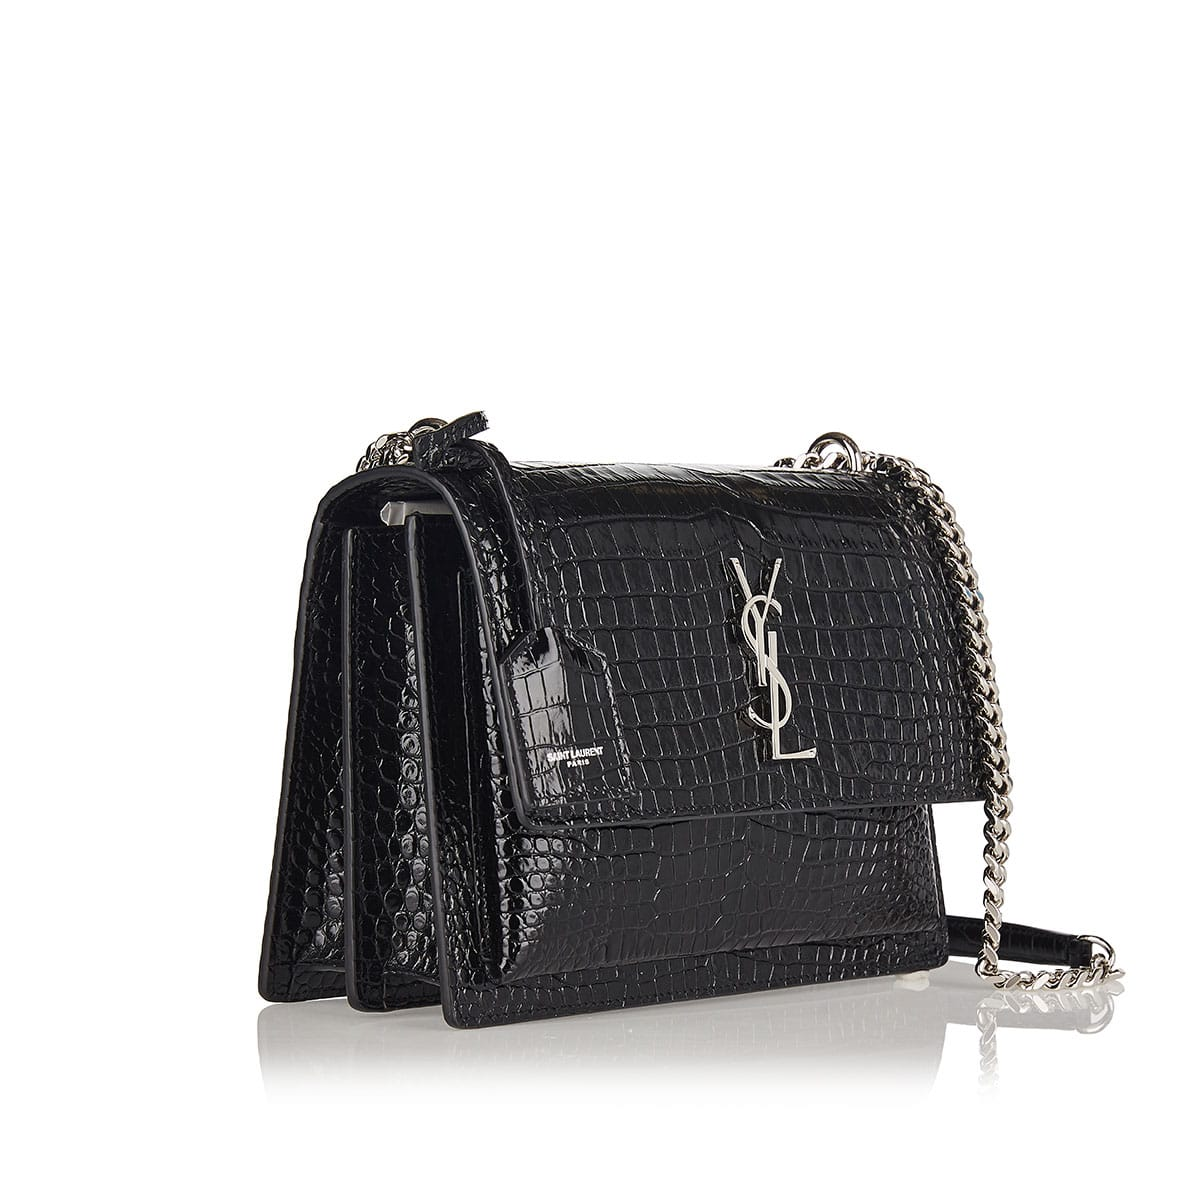 Medium Sunset bag in croc-effect leather